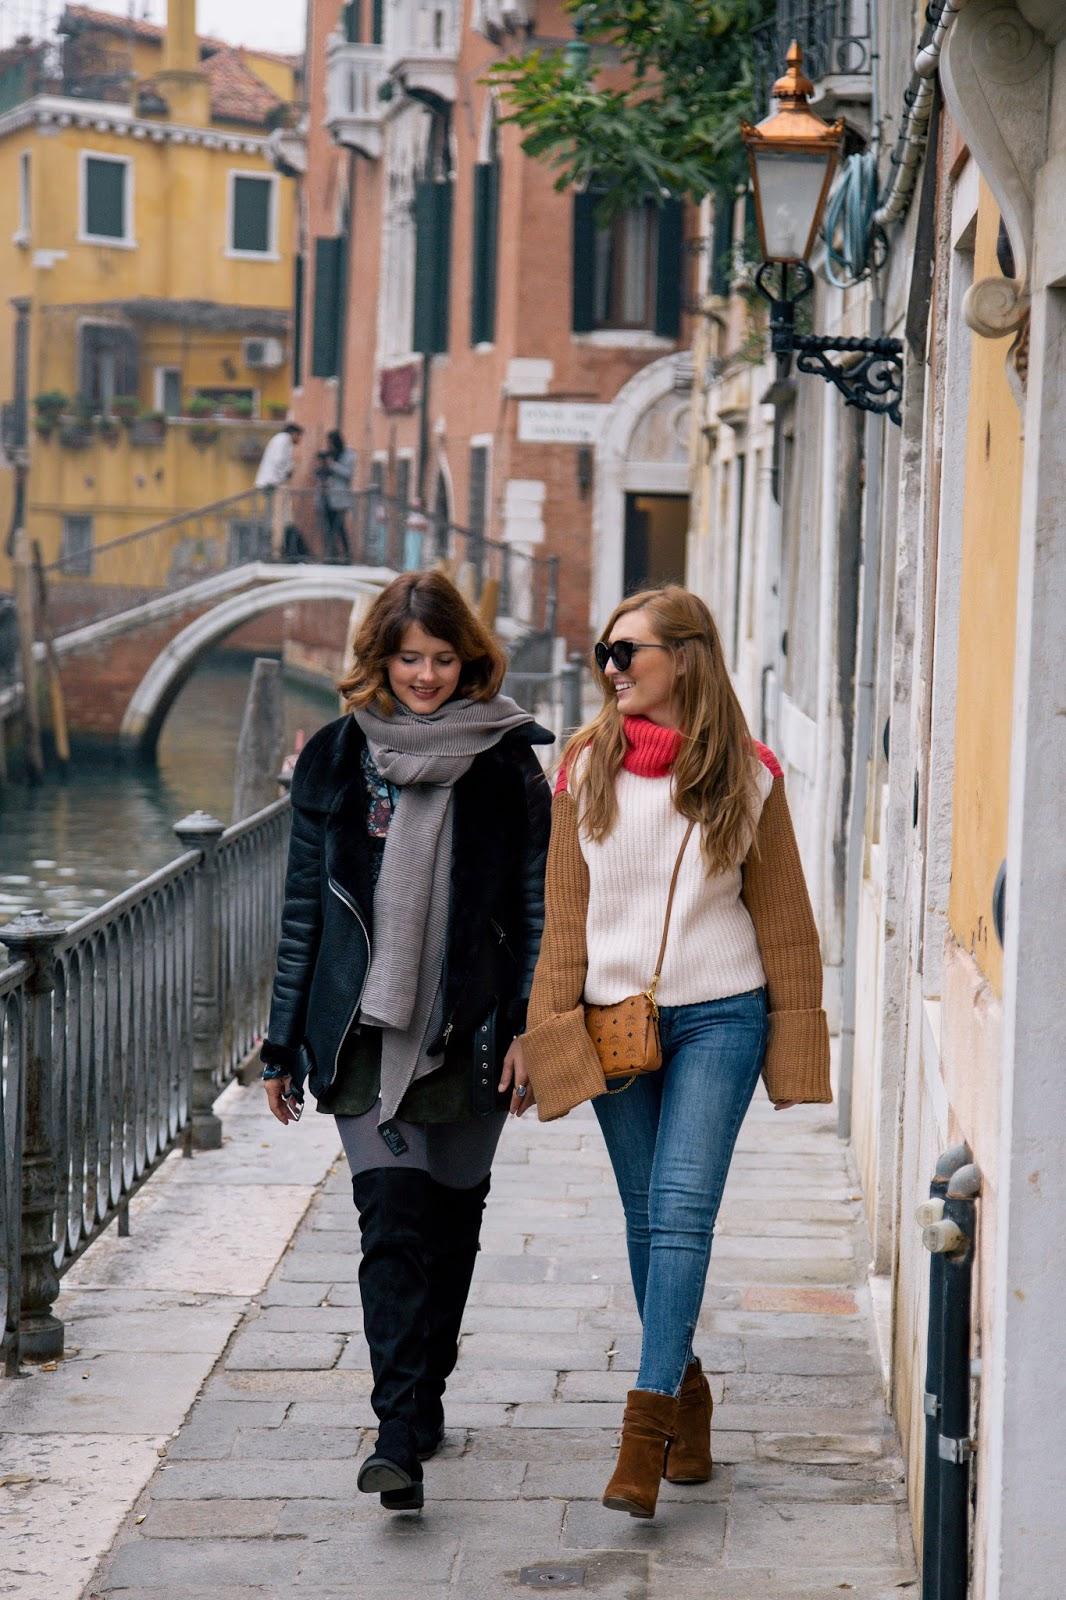 Venedig-blogger-in-venedig-winterlook-winter-outfit-creme-farbene-jacke-creme-felljacke-pelzjacke-braune-wildleder-stiefeletten-rolli